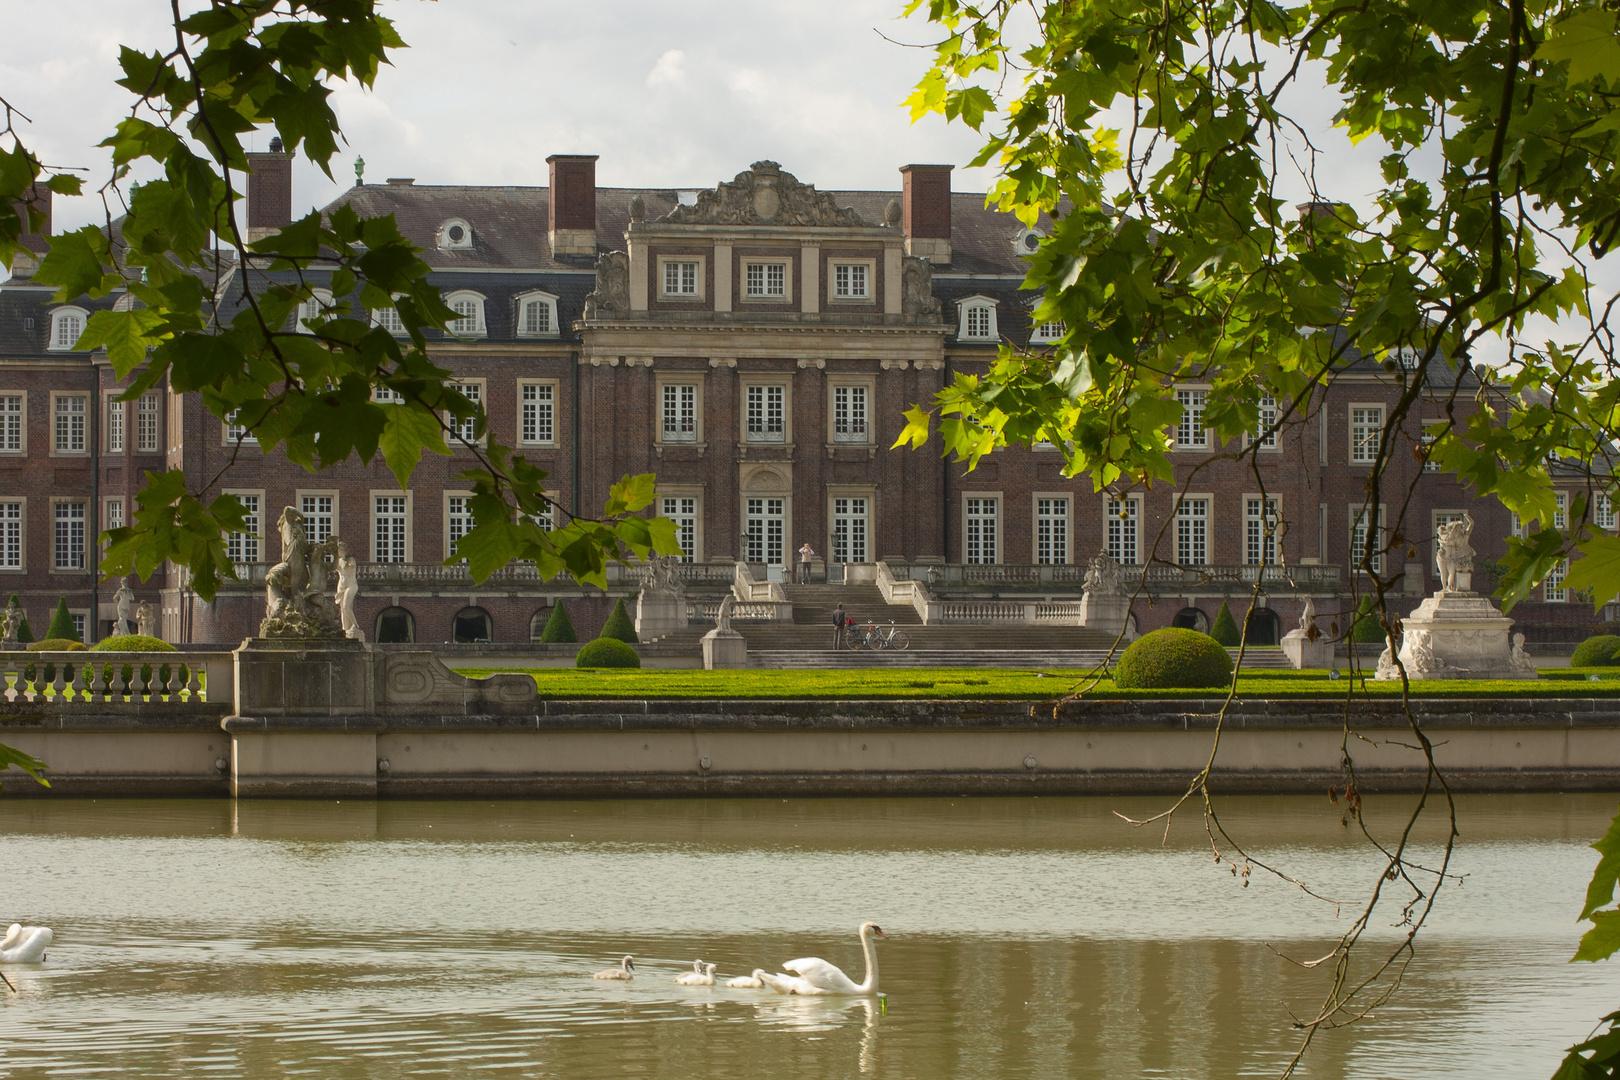 Schloss Nordkirchen oder das 'Westfälische Versailles'